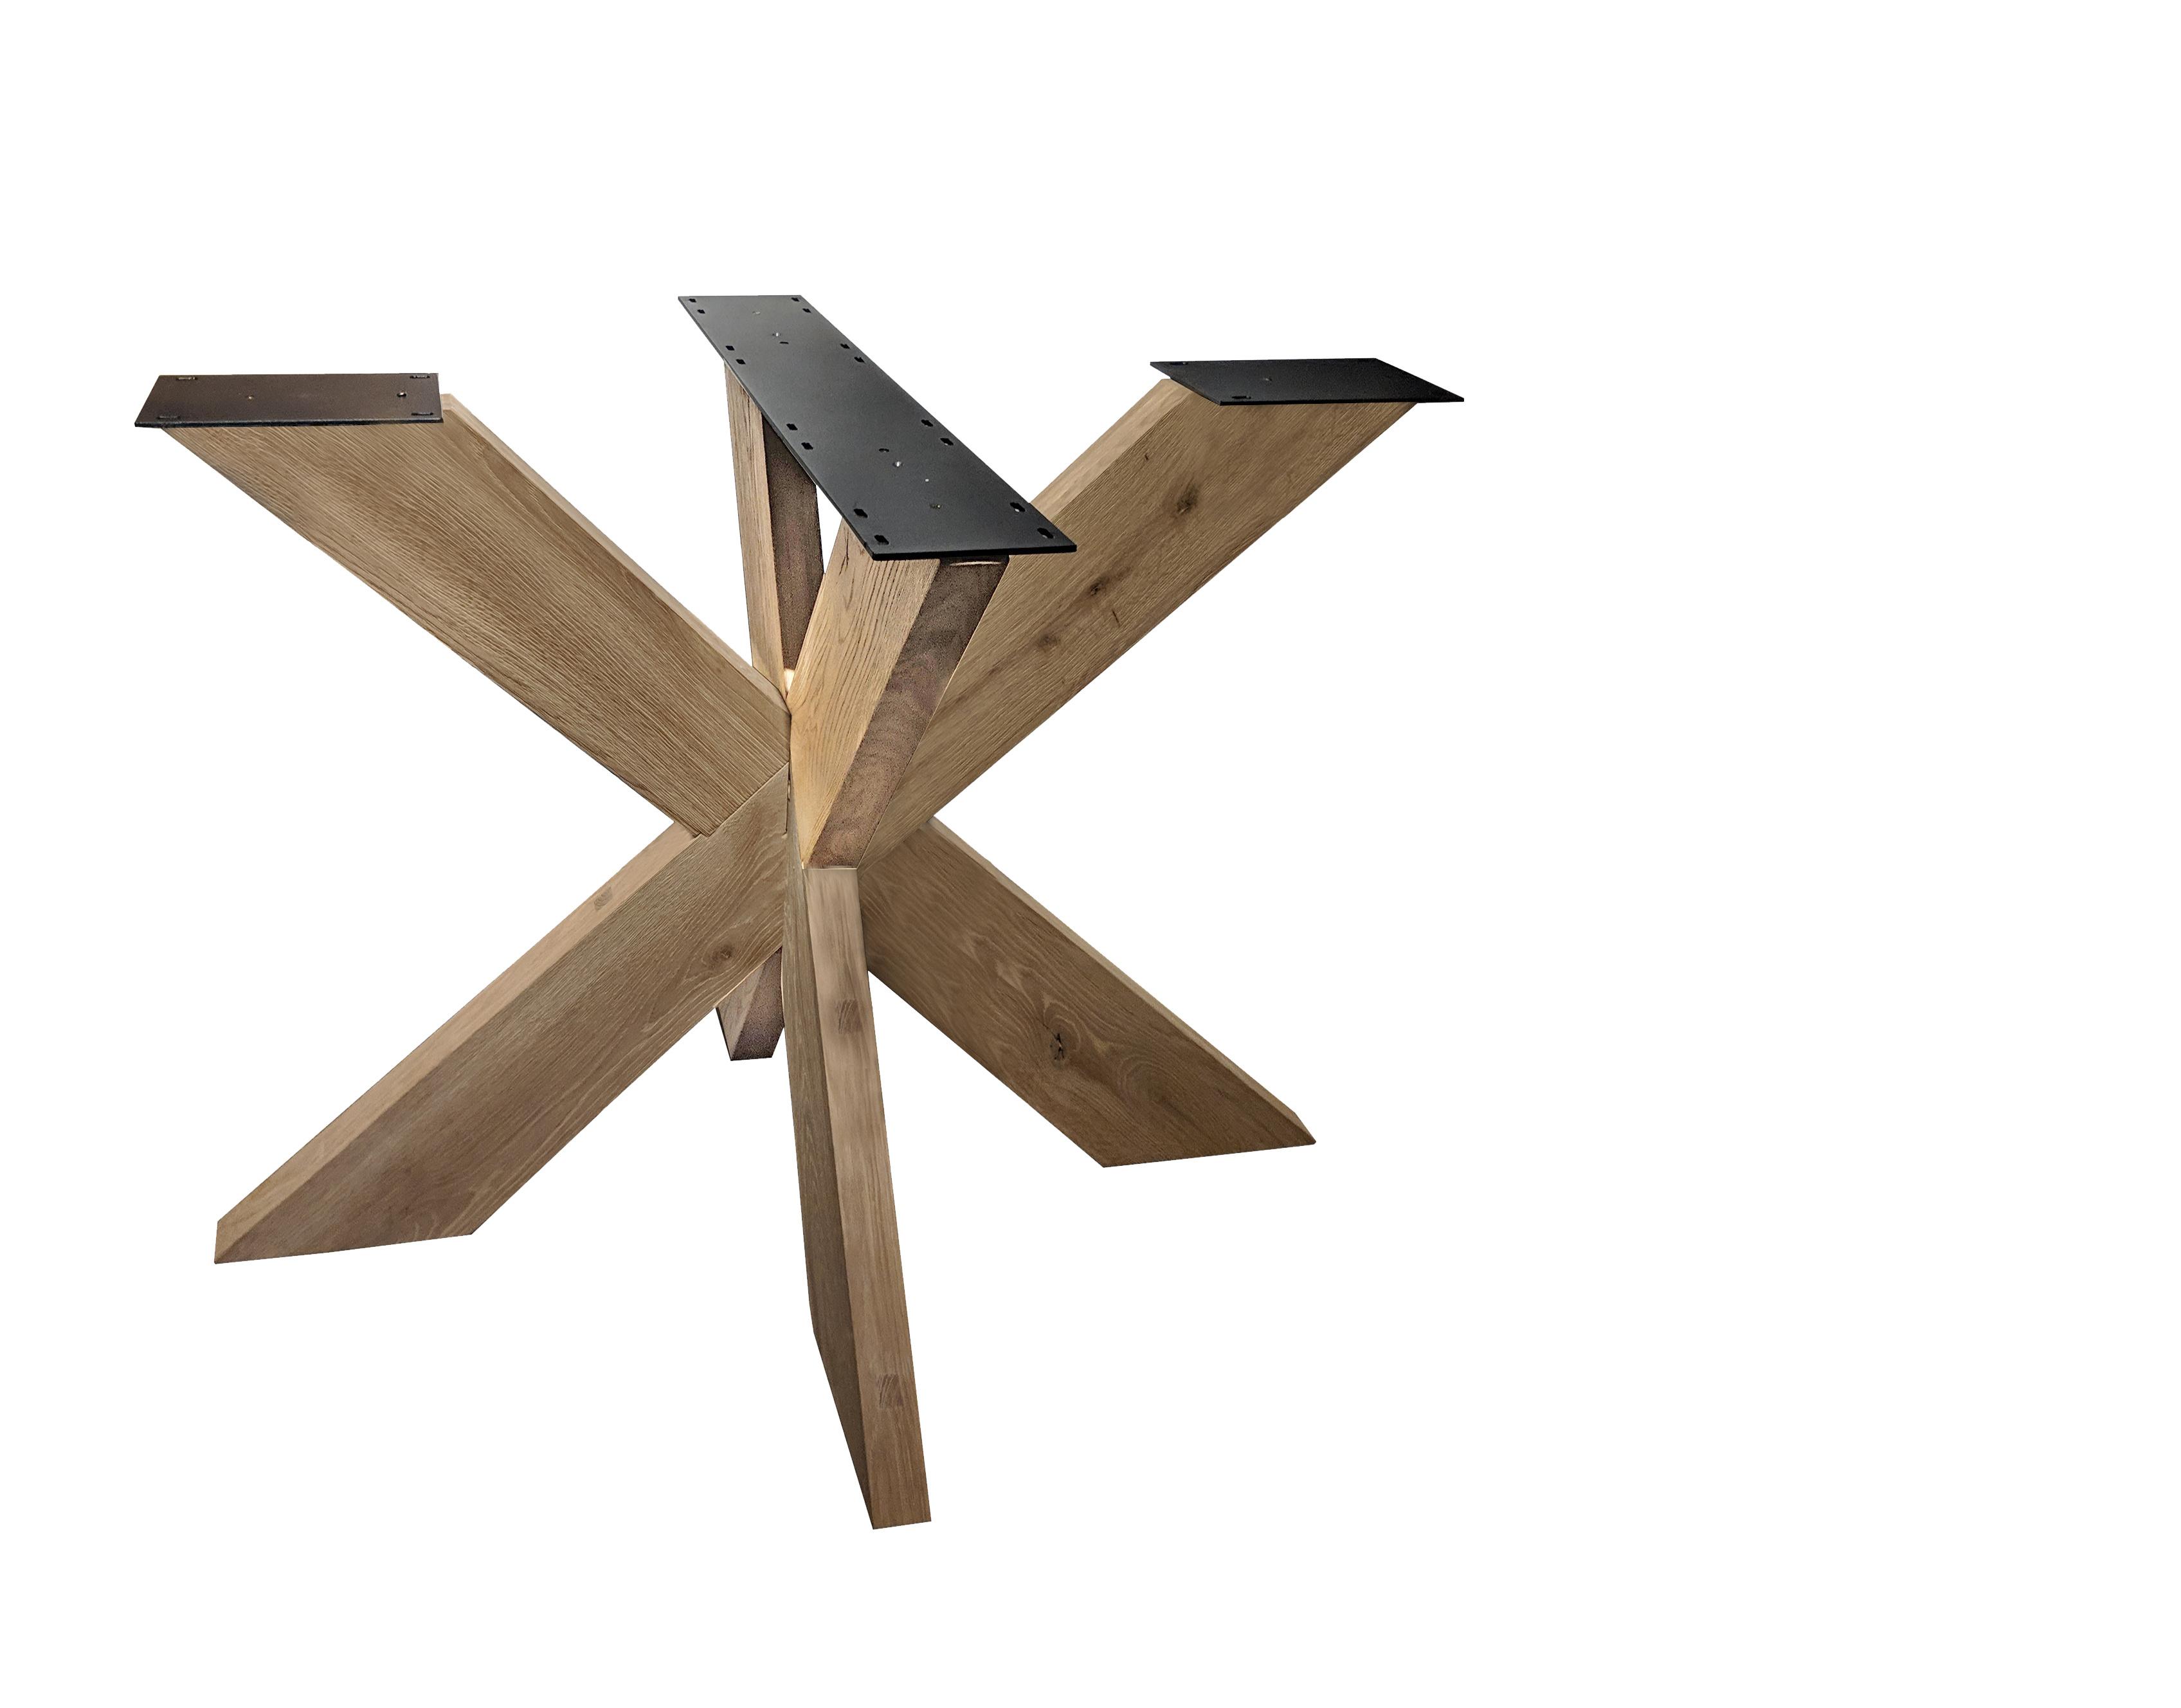 Eiken dubbele kruispoot 16x6 cm - 72 cm hoog - 130x130 cm  - Rustiek licht geborsteld -  3D kruis / X-poot - 12% kd Europees eikenhout